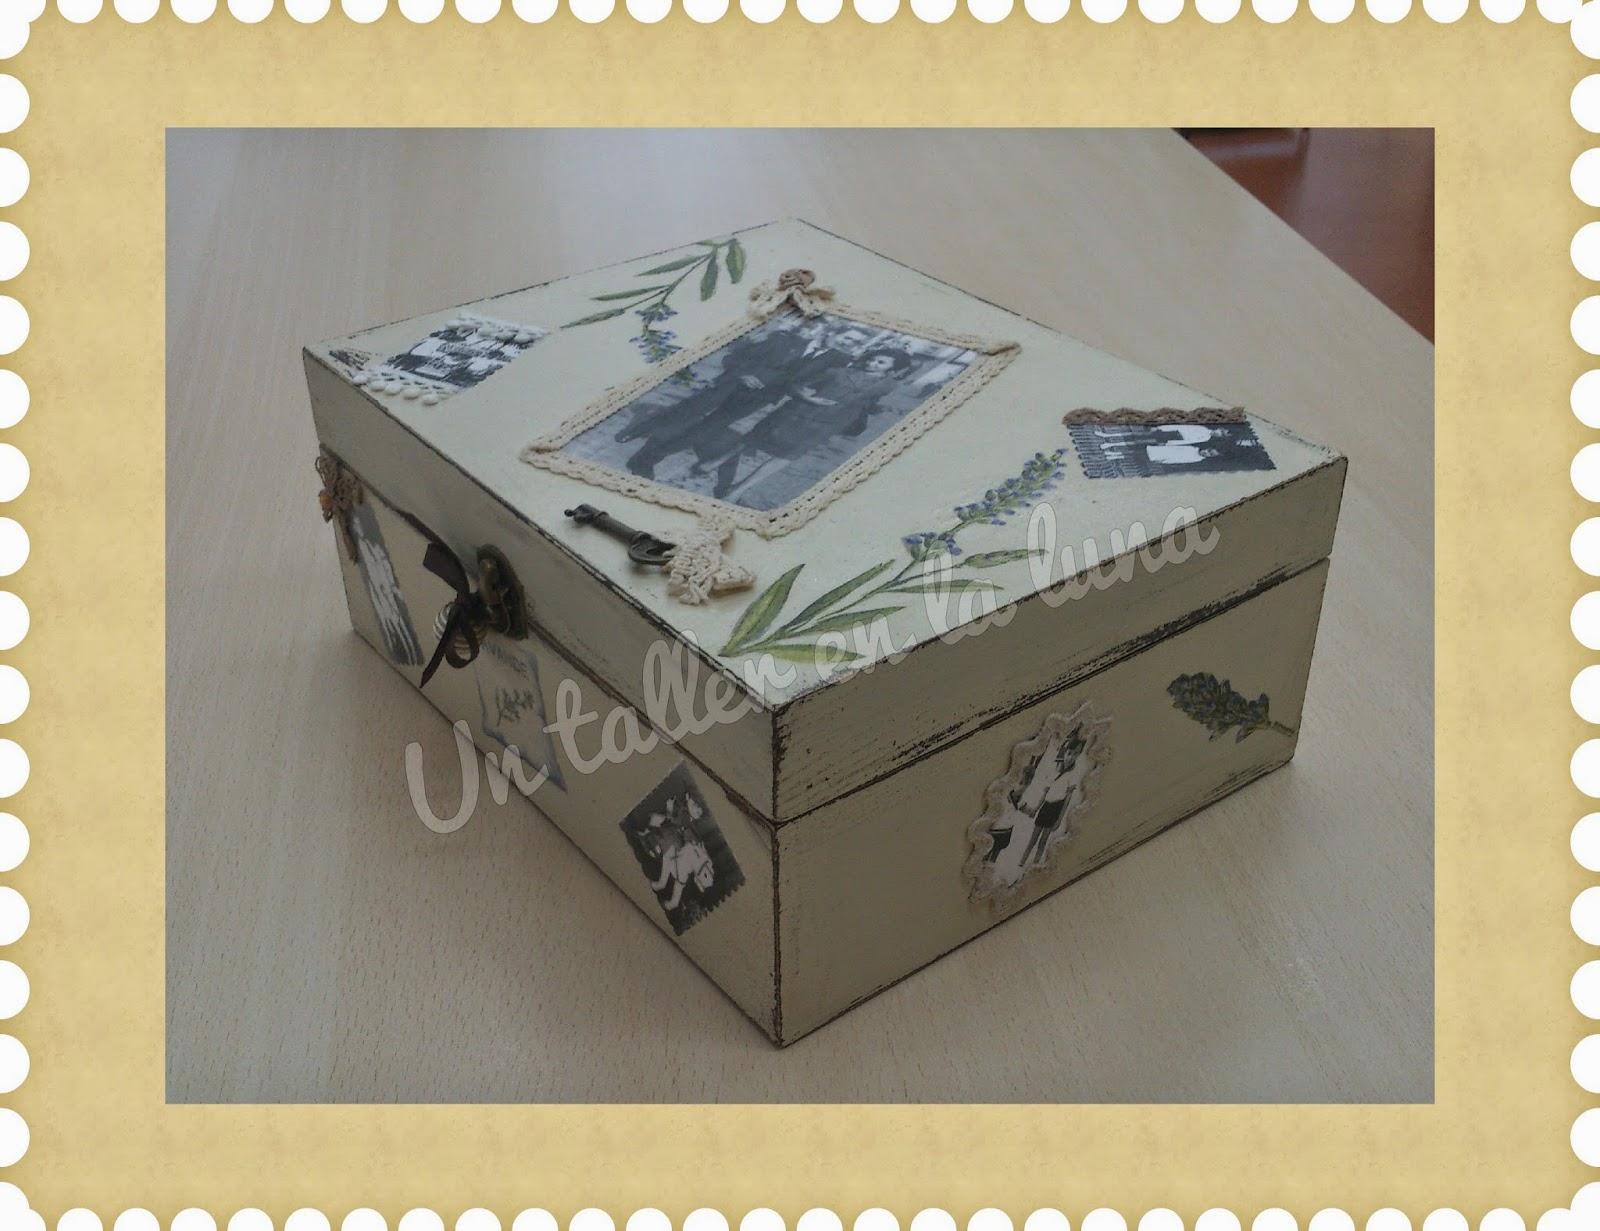 Caja vintage aprender manualidades es - Manualidades caja de madera ...